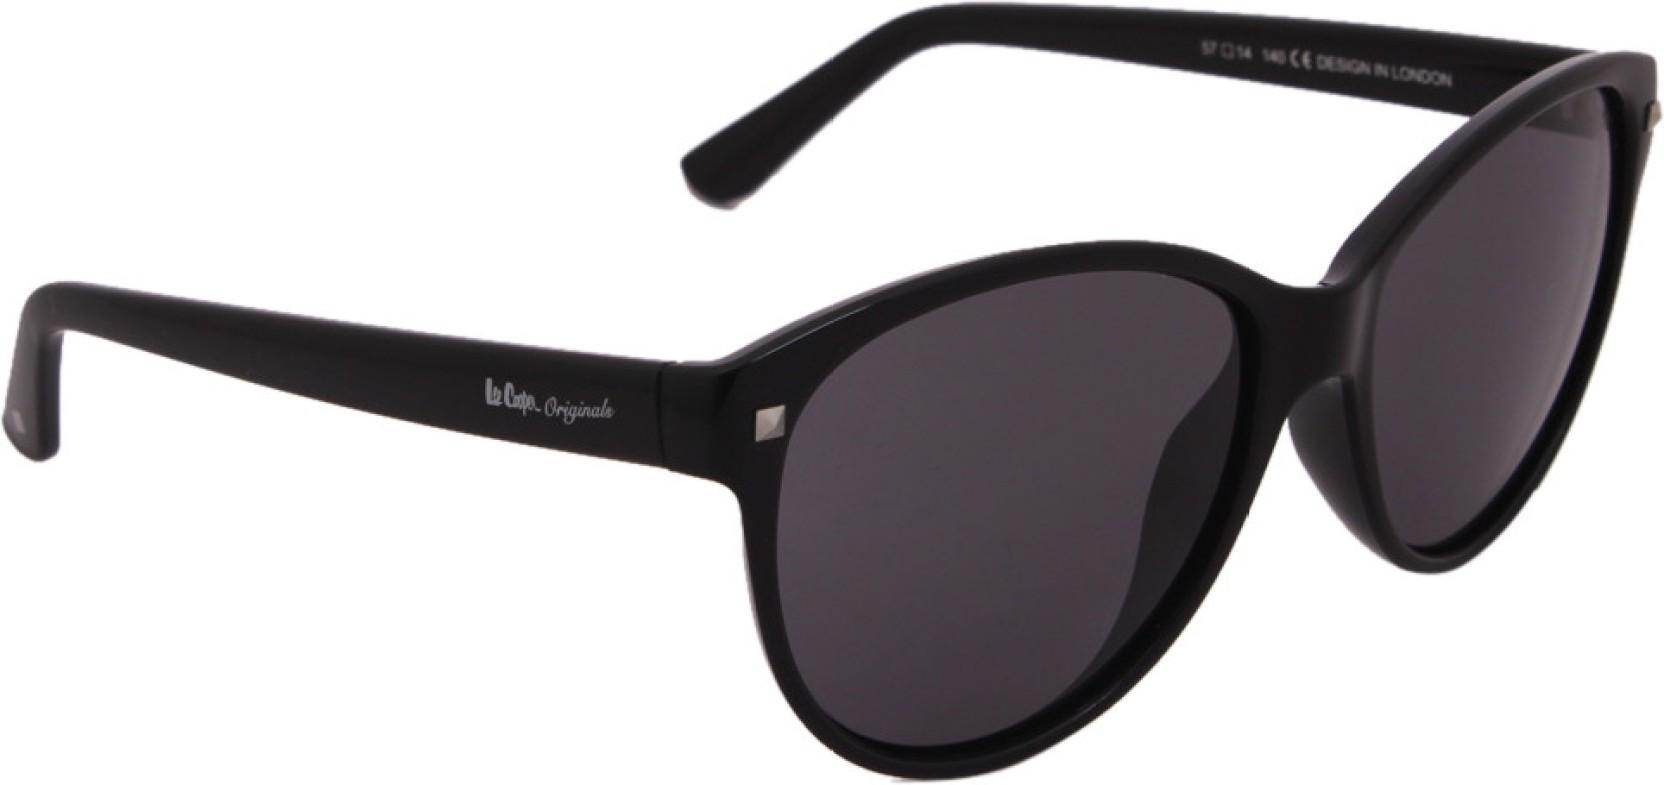 a4273f03ea Buy Lee Cooper Cat-eye Sunglasses Grey For Women Online   Best ...